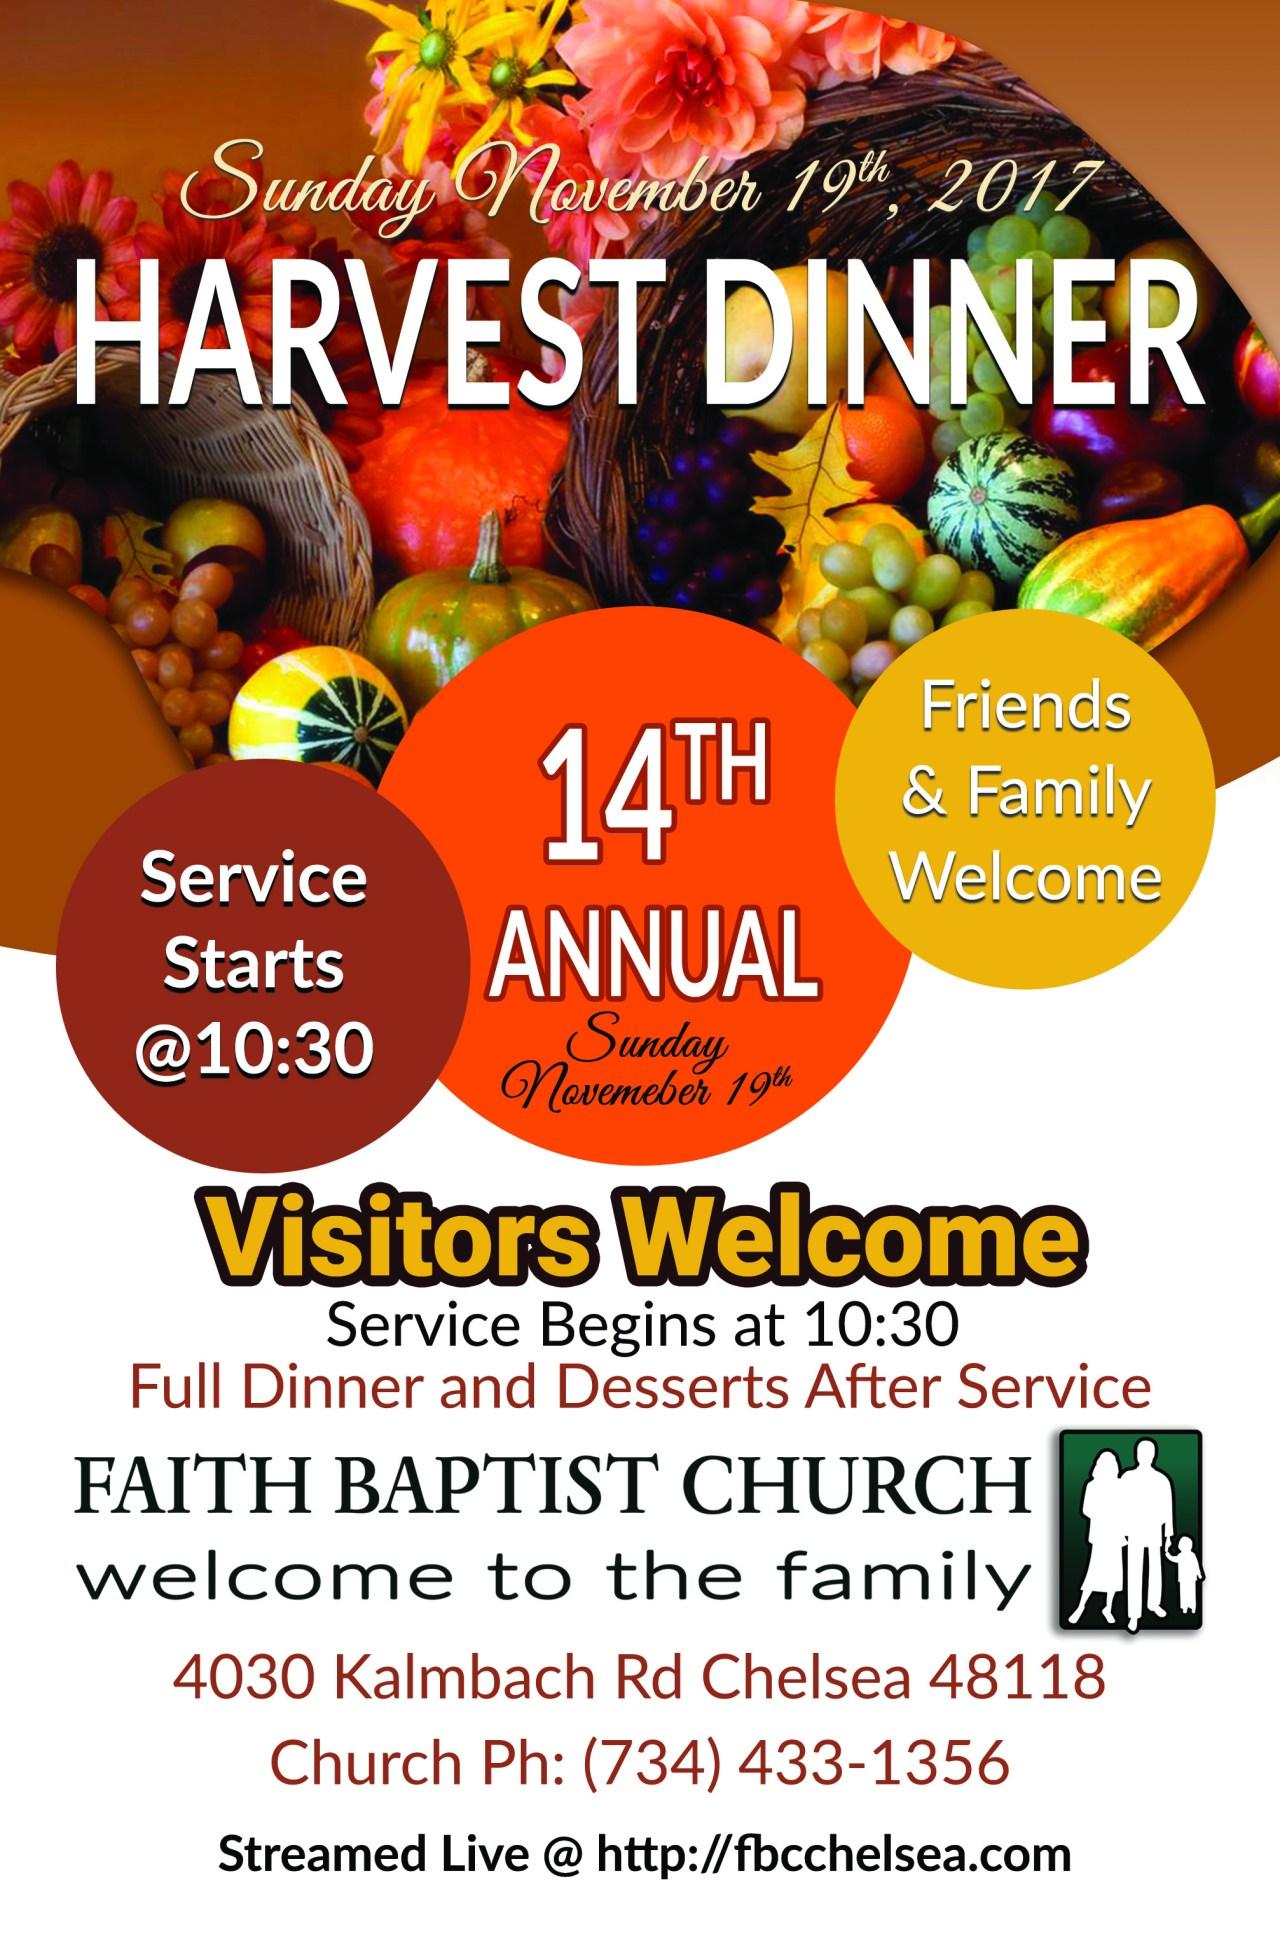 2017 Faith Baptist Church Harvest Dinner Poster Image